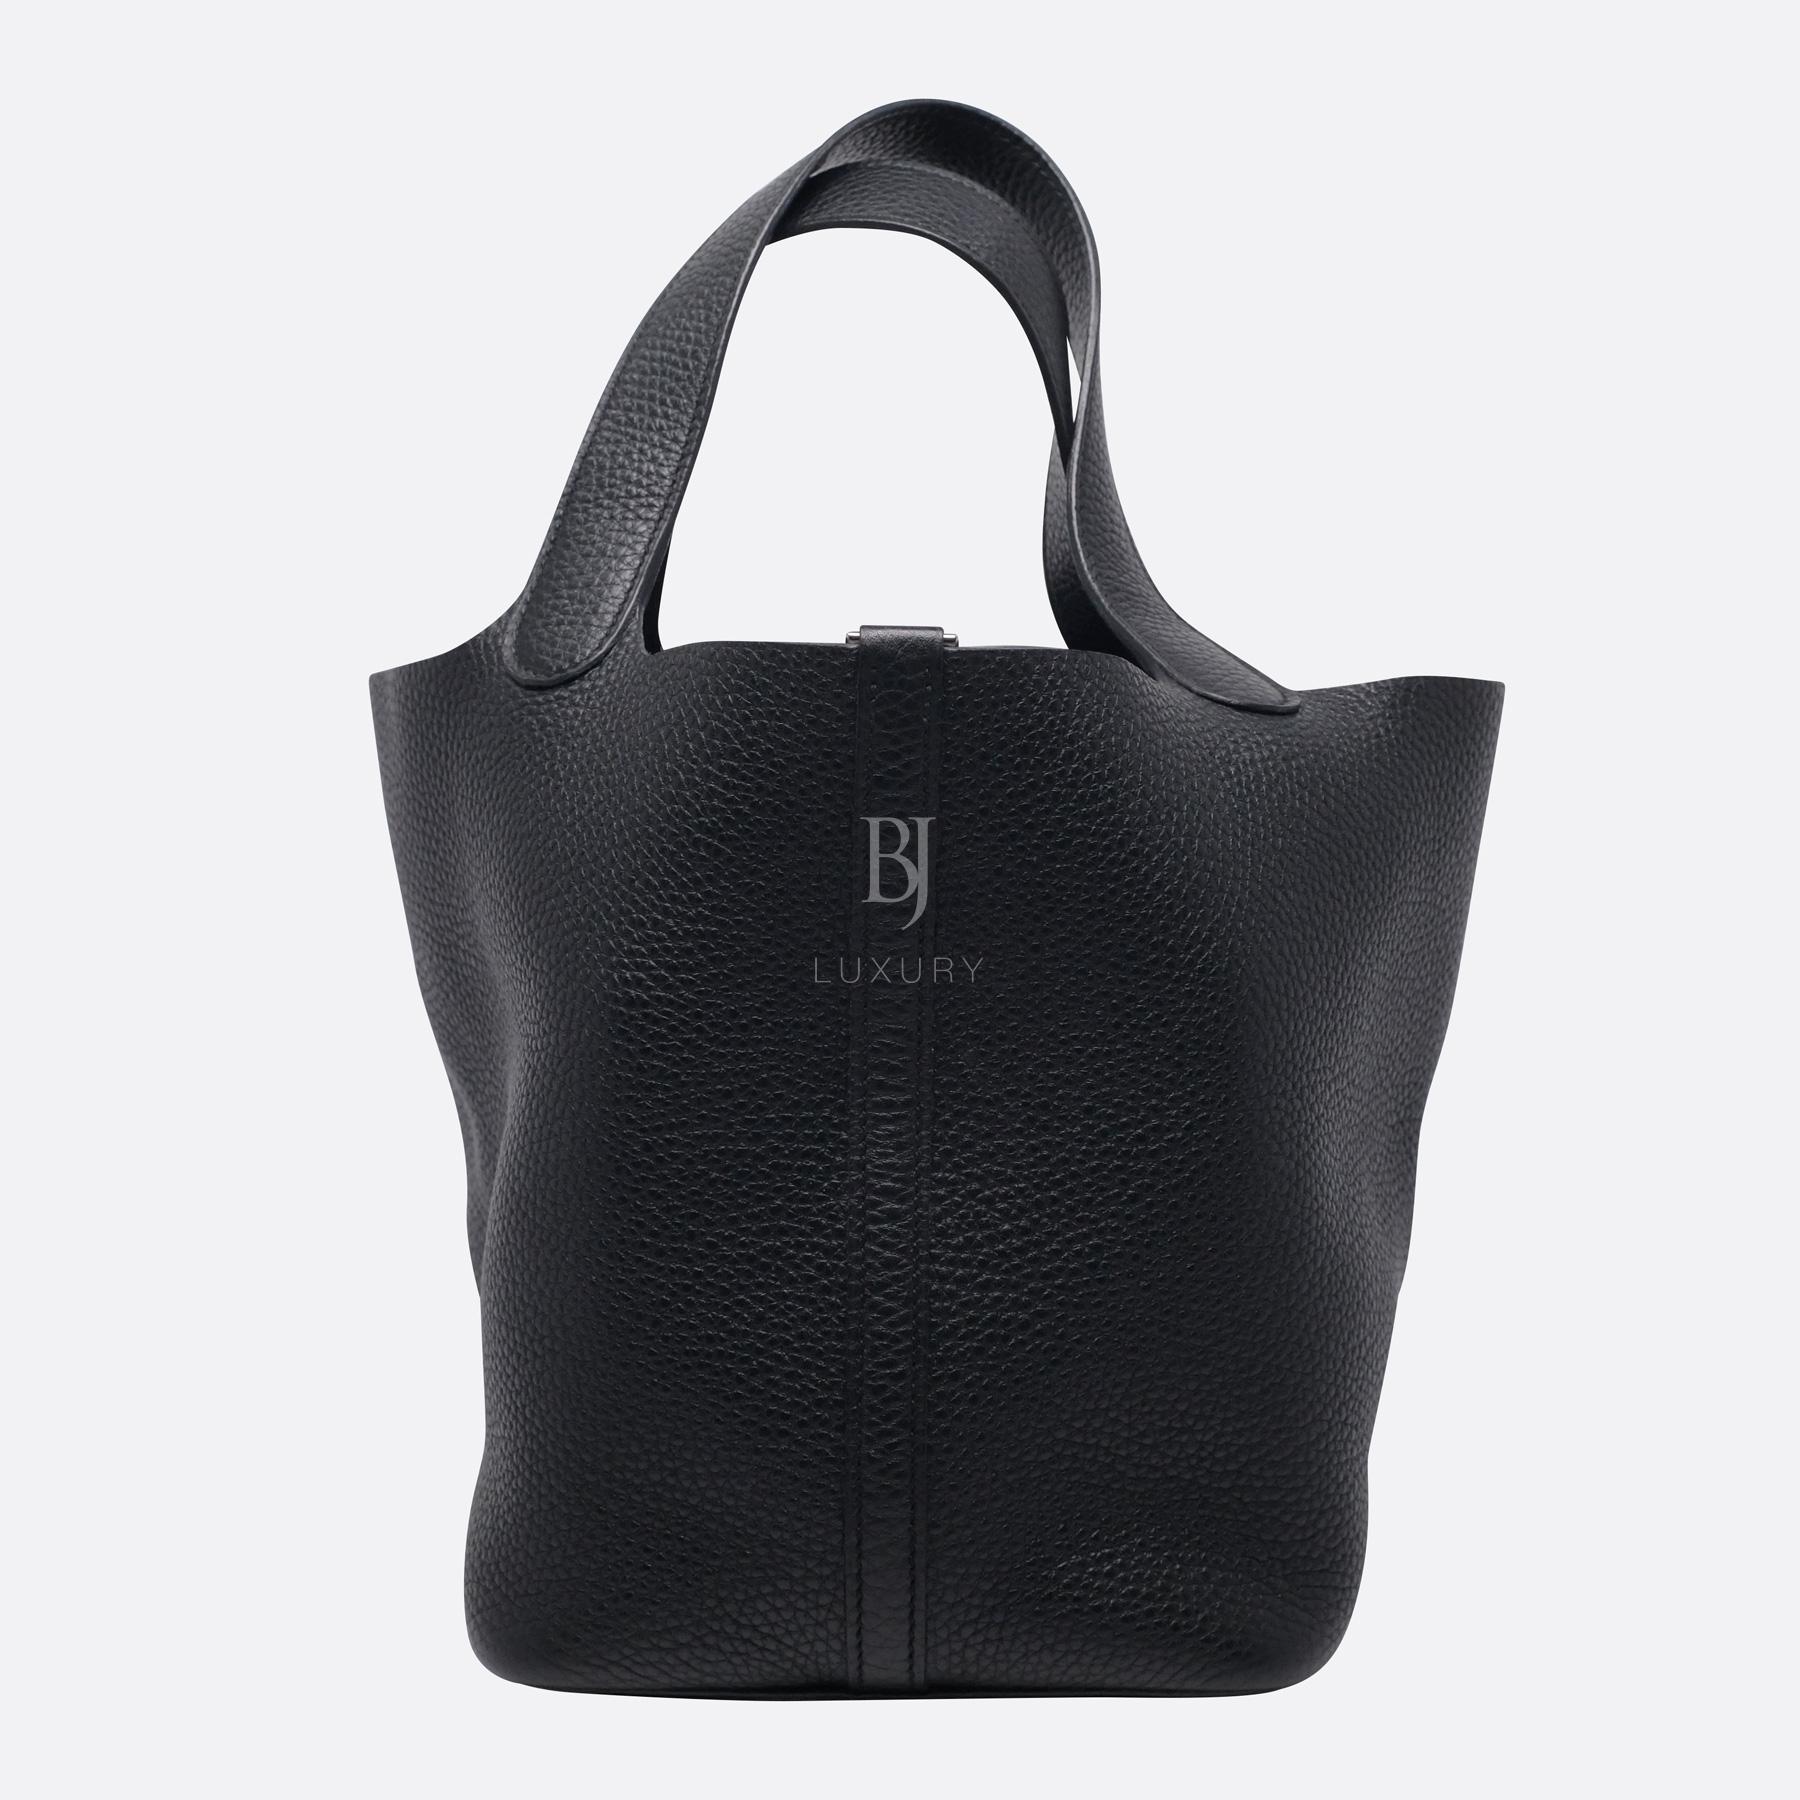 Hermes Picotin 22 Palladium Clemence BJ Luxury 4.jpg